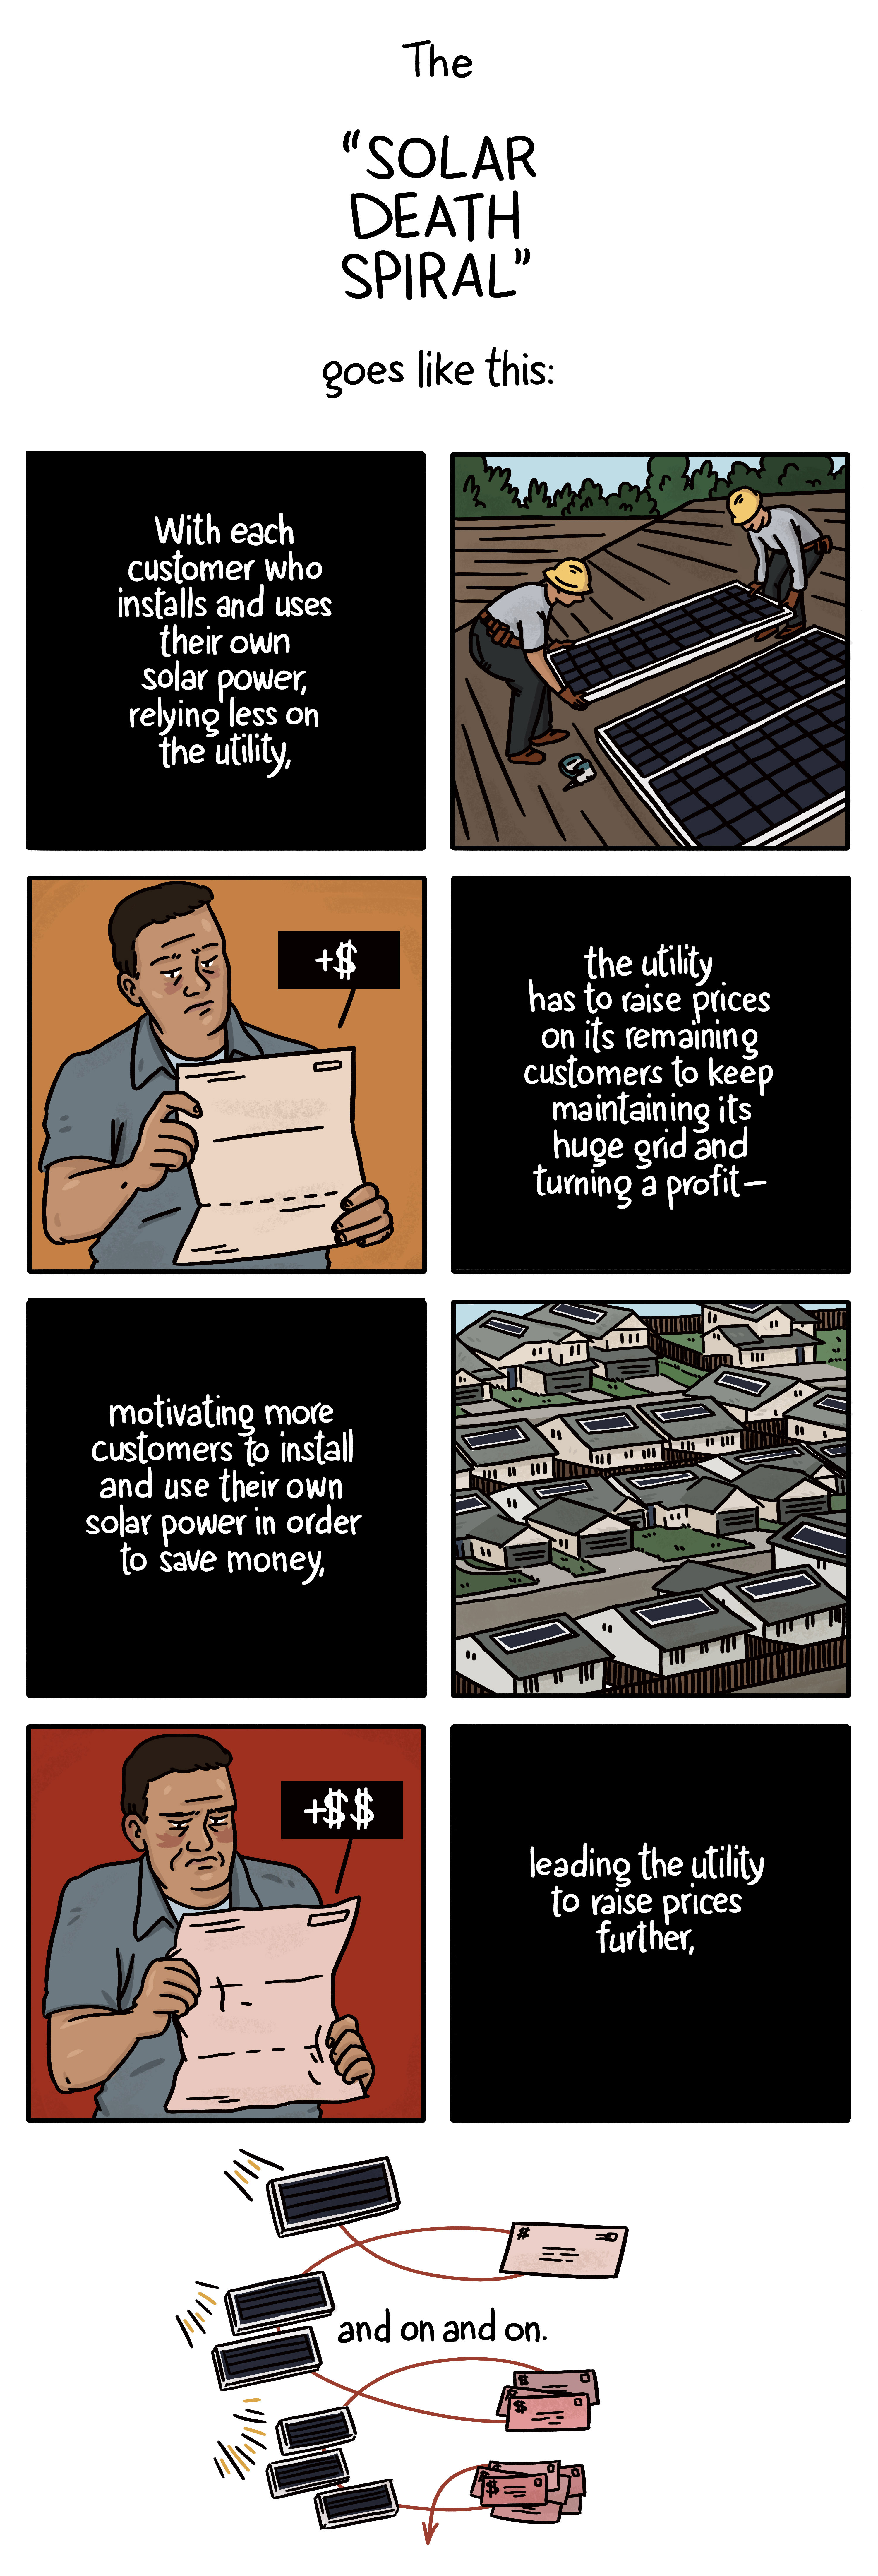 illustration explaining the so-called